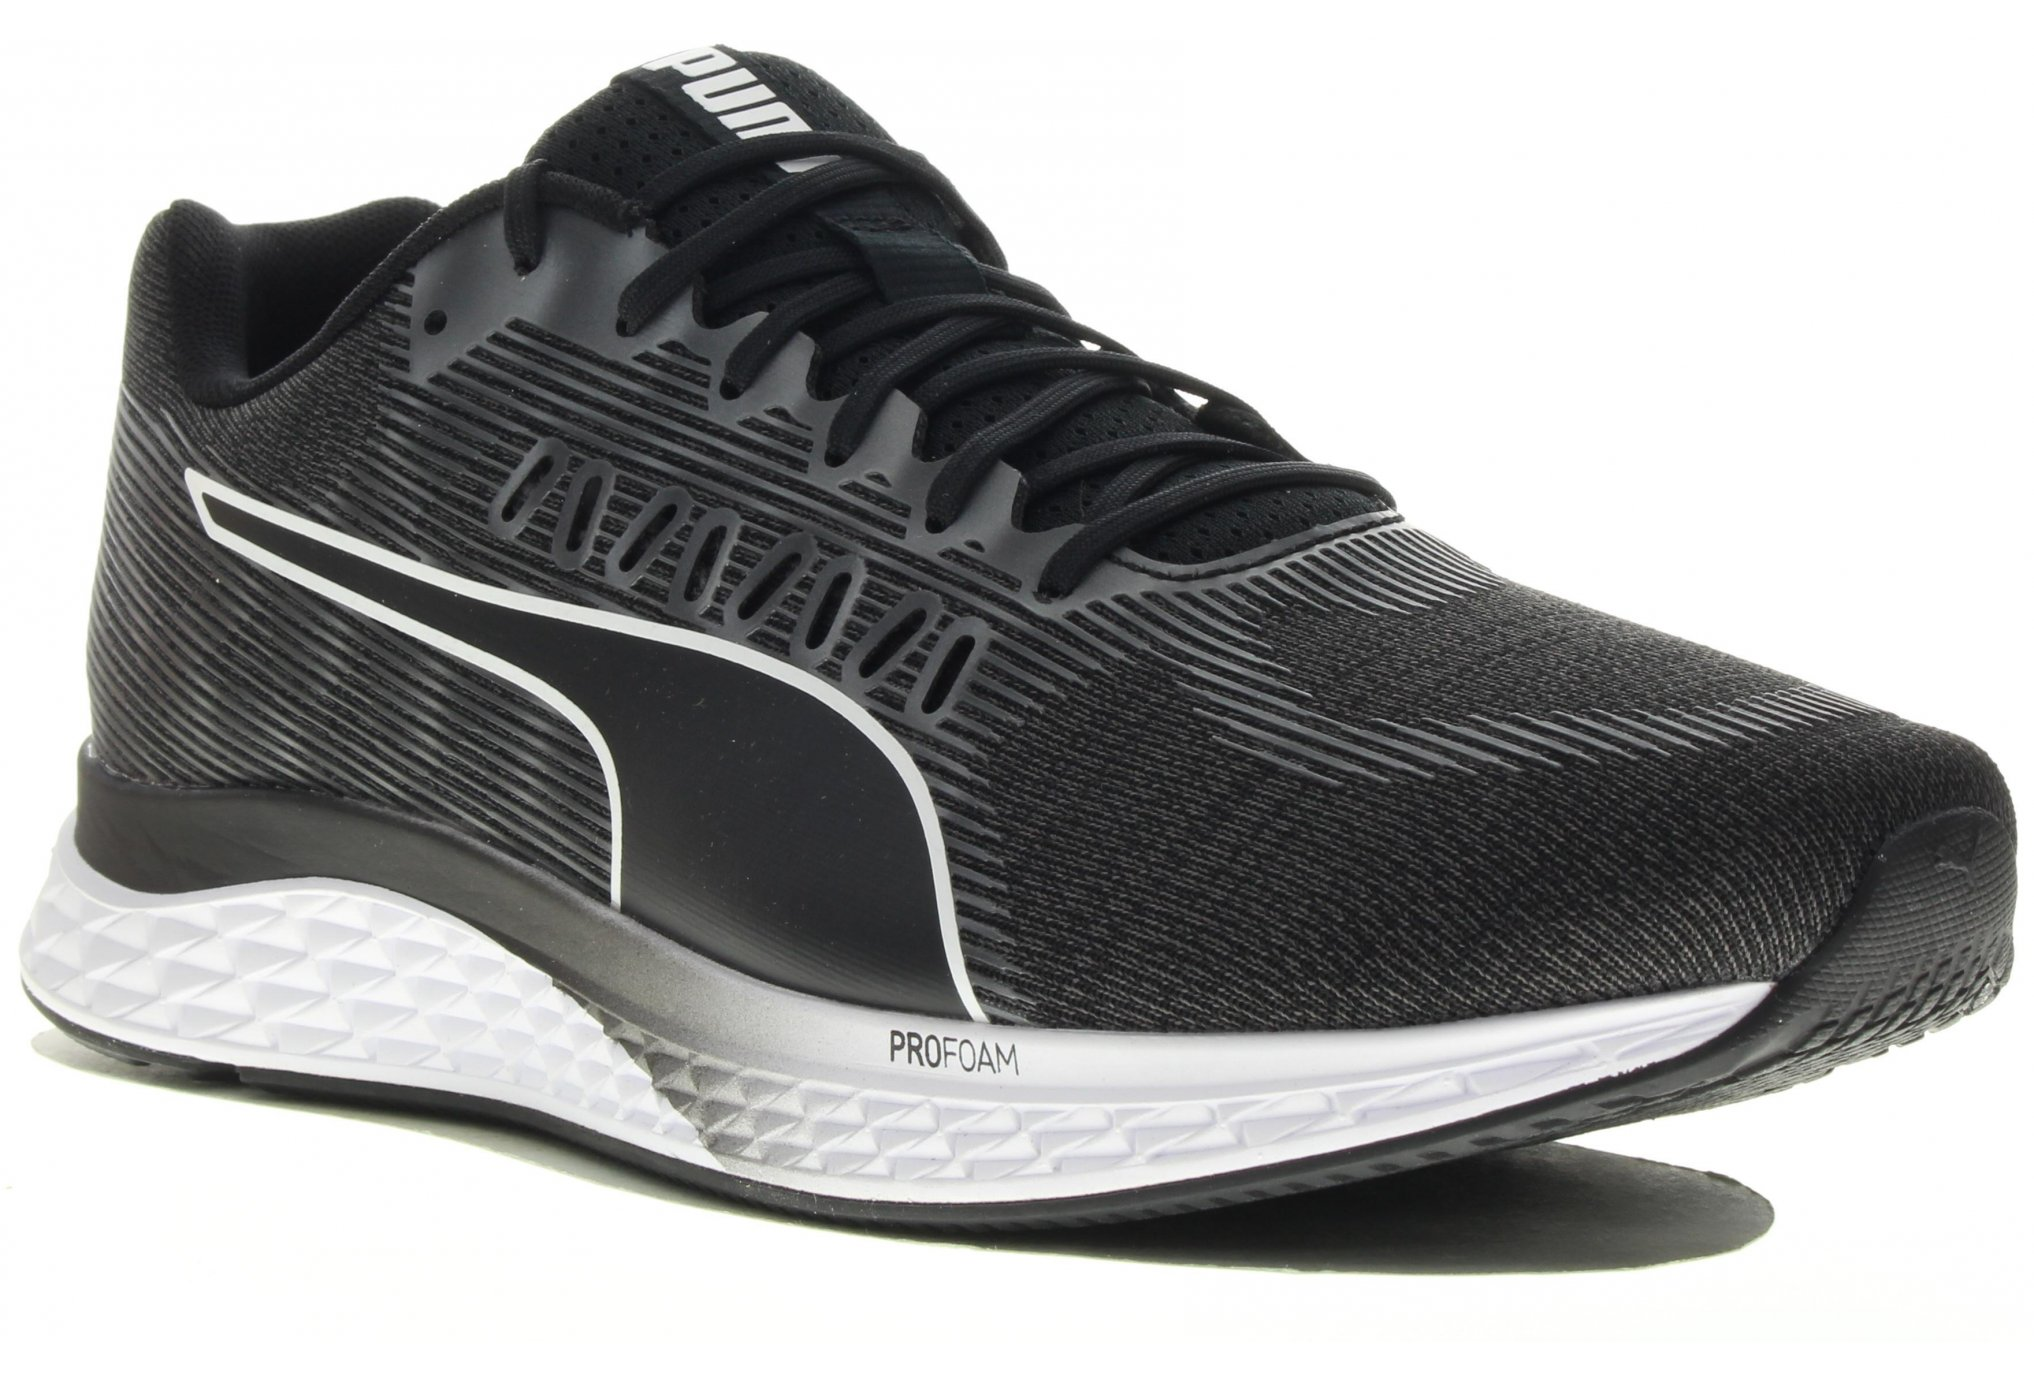 Puma Speed Sutamina M Diététique Chaussures homme